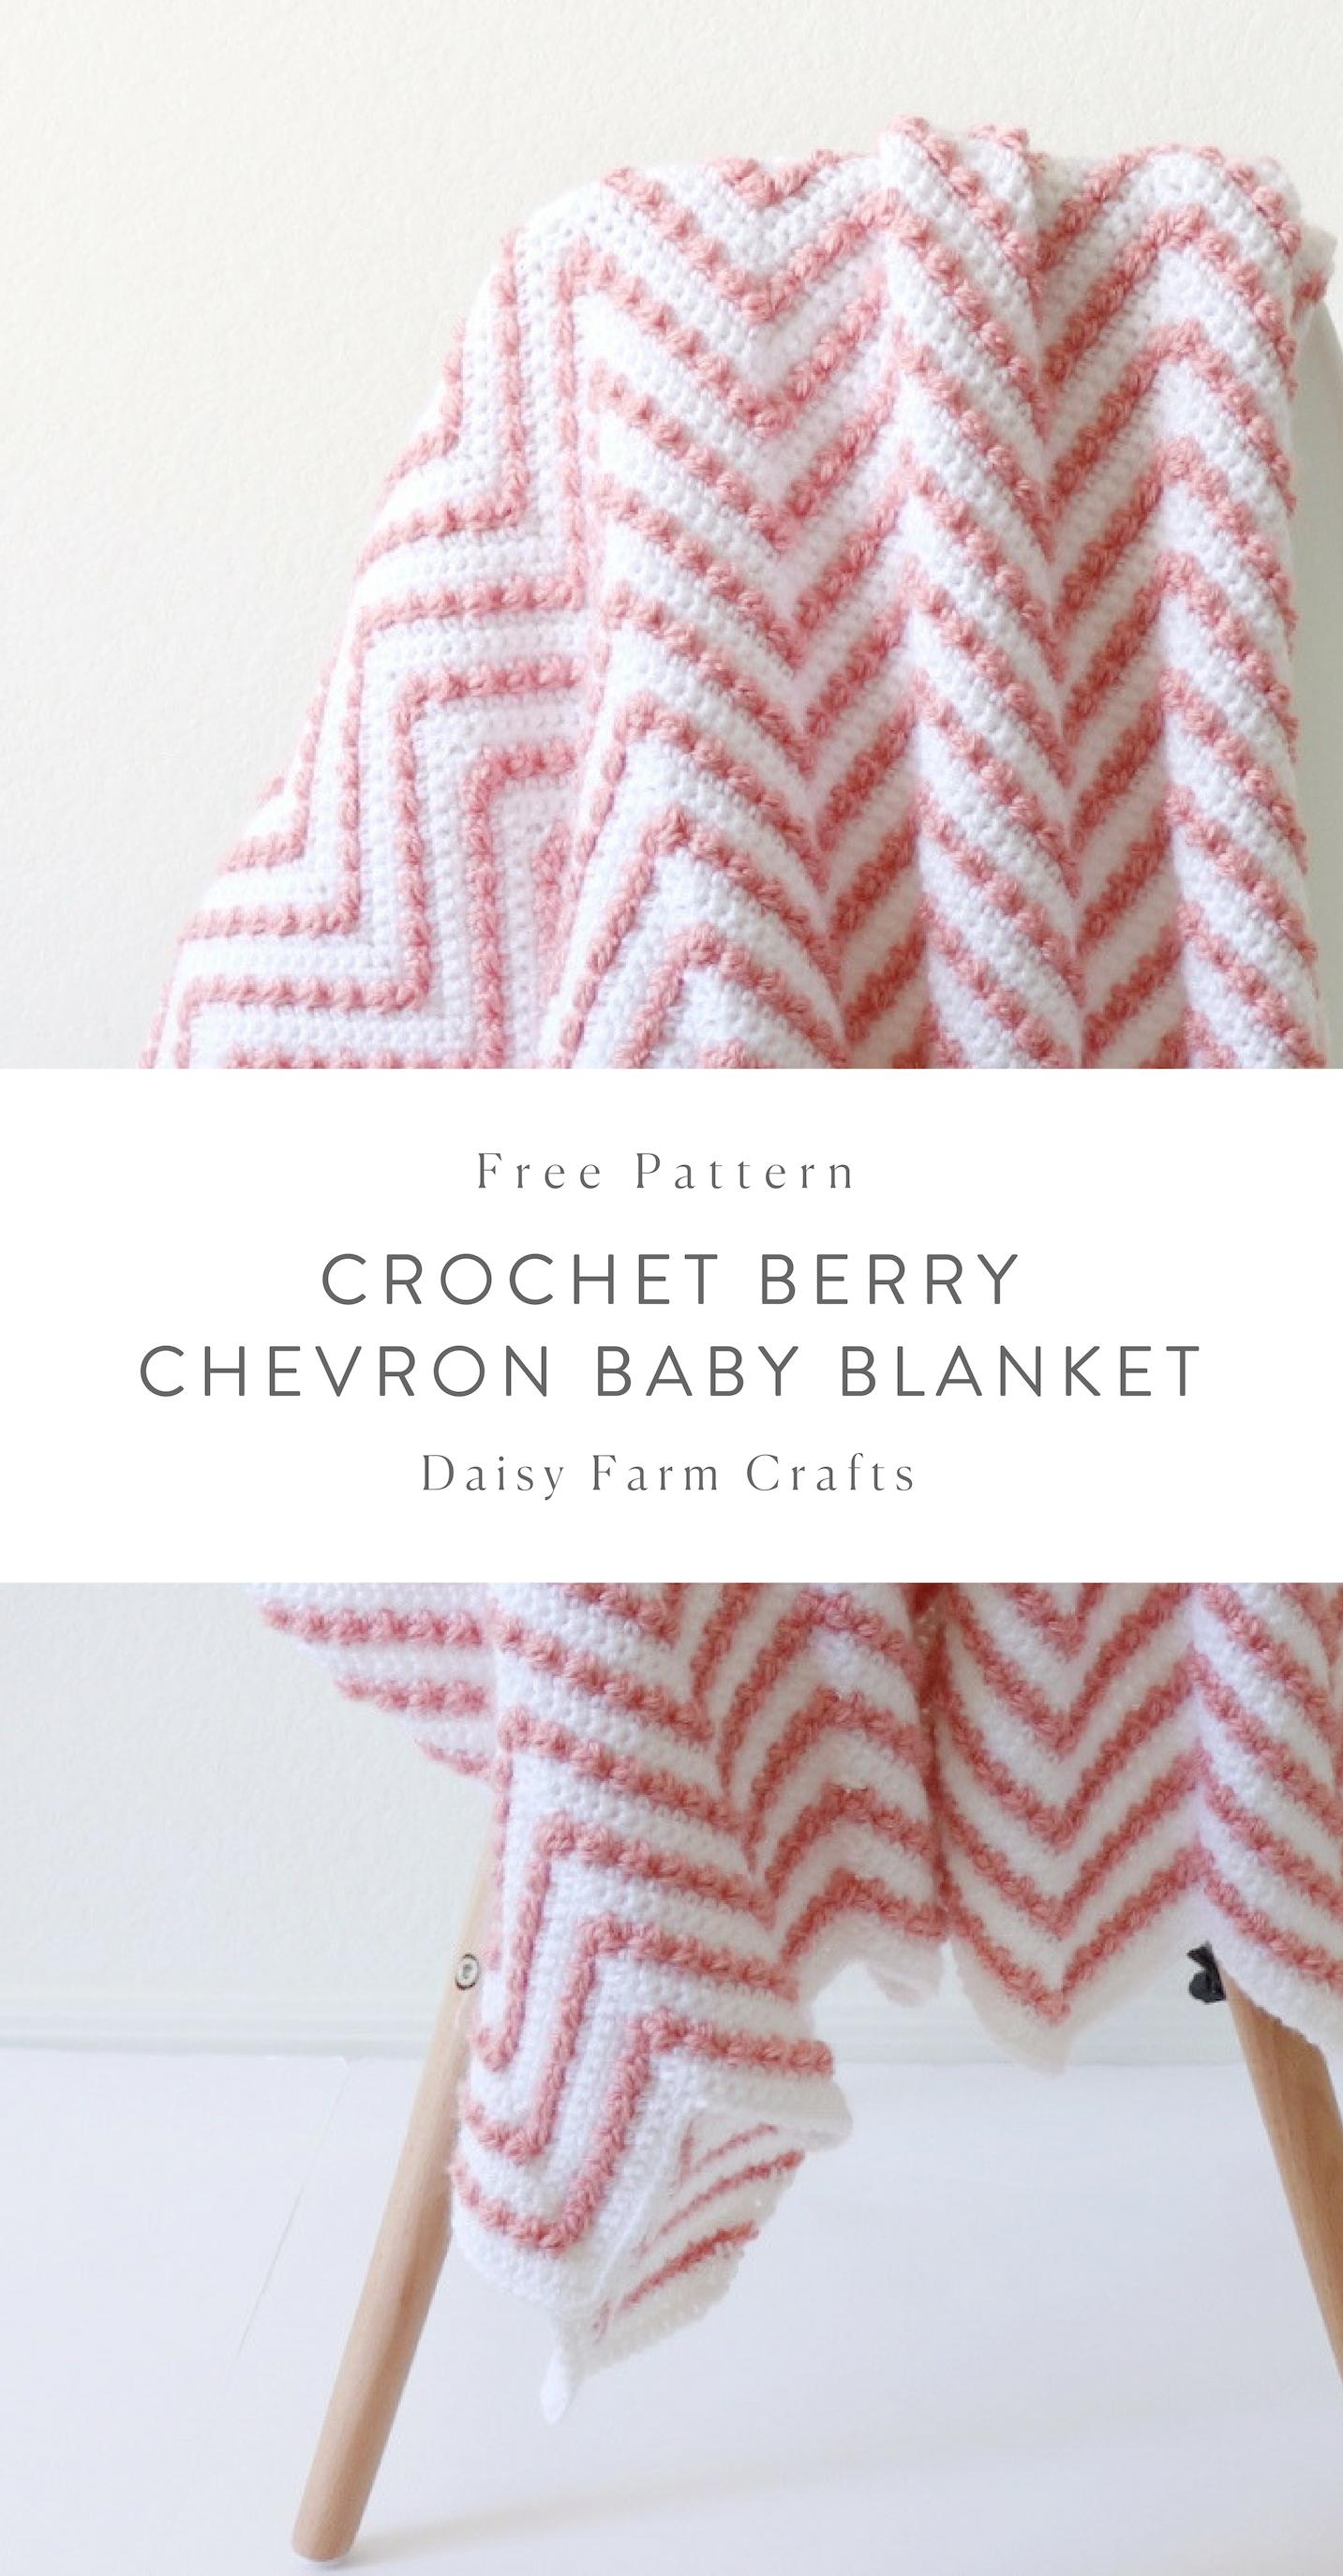 Free Pattern - Crochet Berry Chevron Baby Blanket | Crochet ...